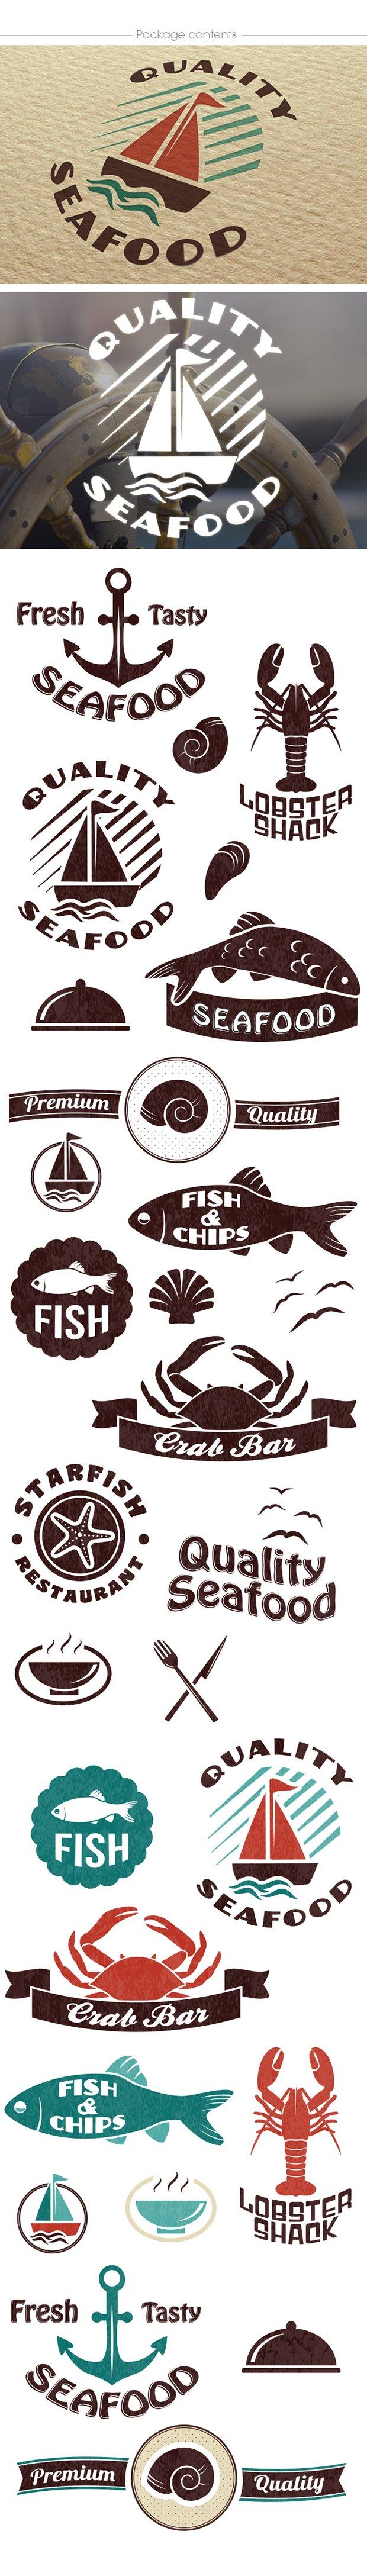 logozilla2-logo-builder-seafood-large